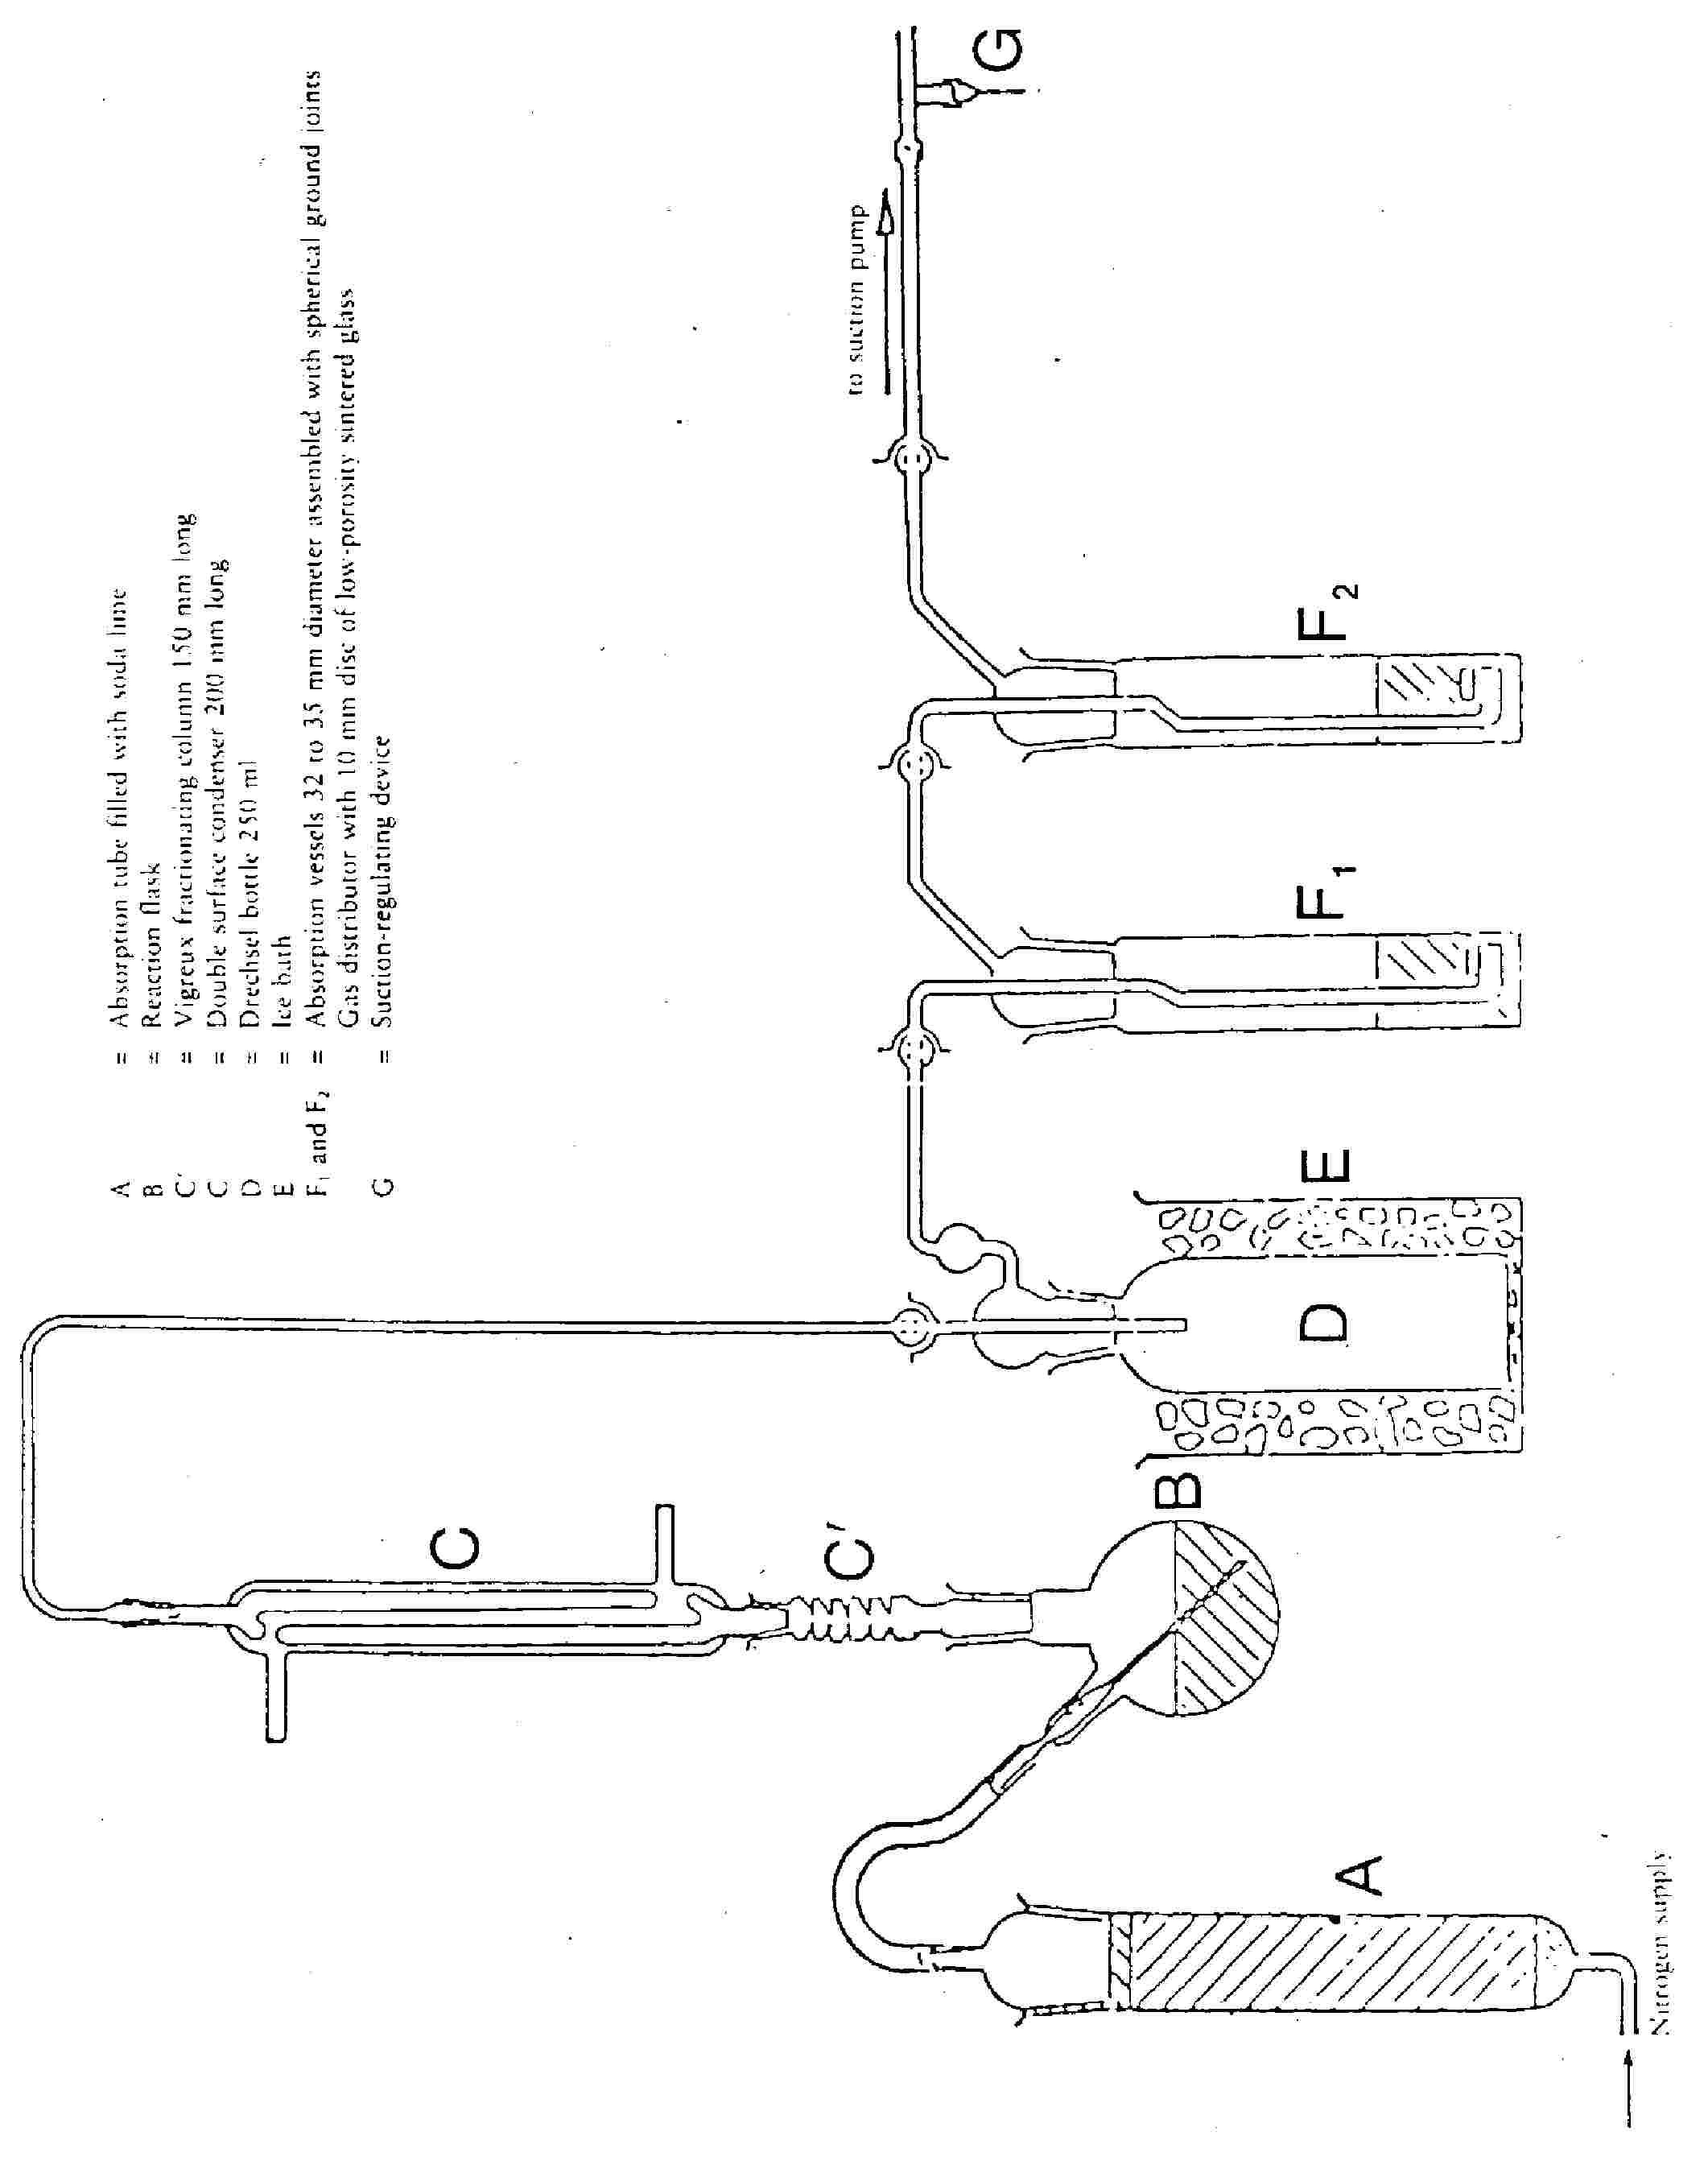 Eur Lex 02003r2003 20090420 Hr 1977 Yamaha Enticer 250 Wiring Diagram Image